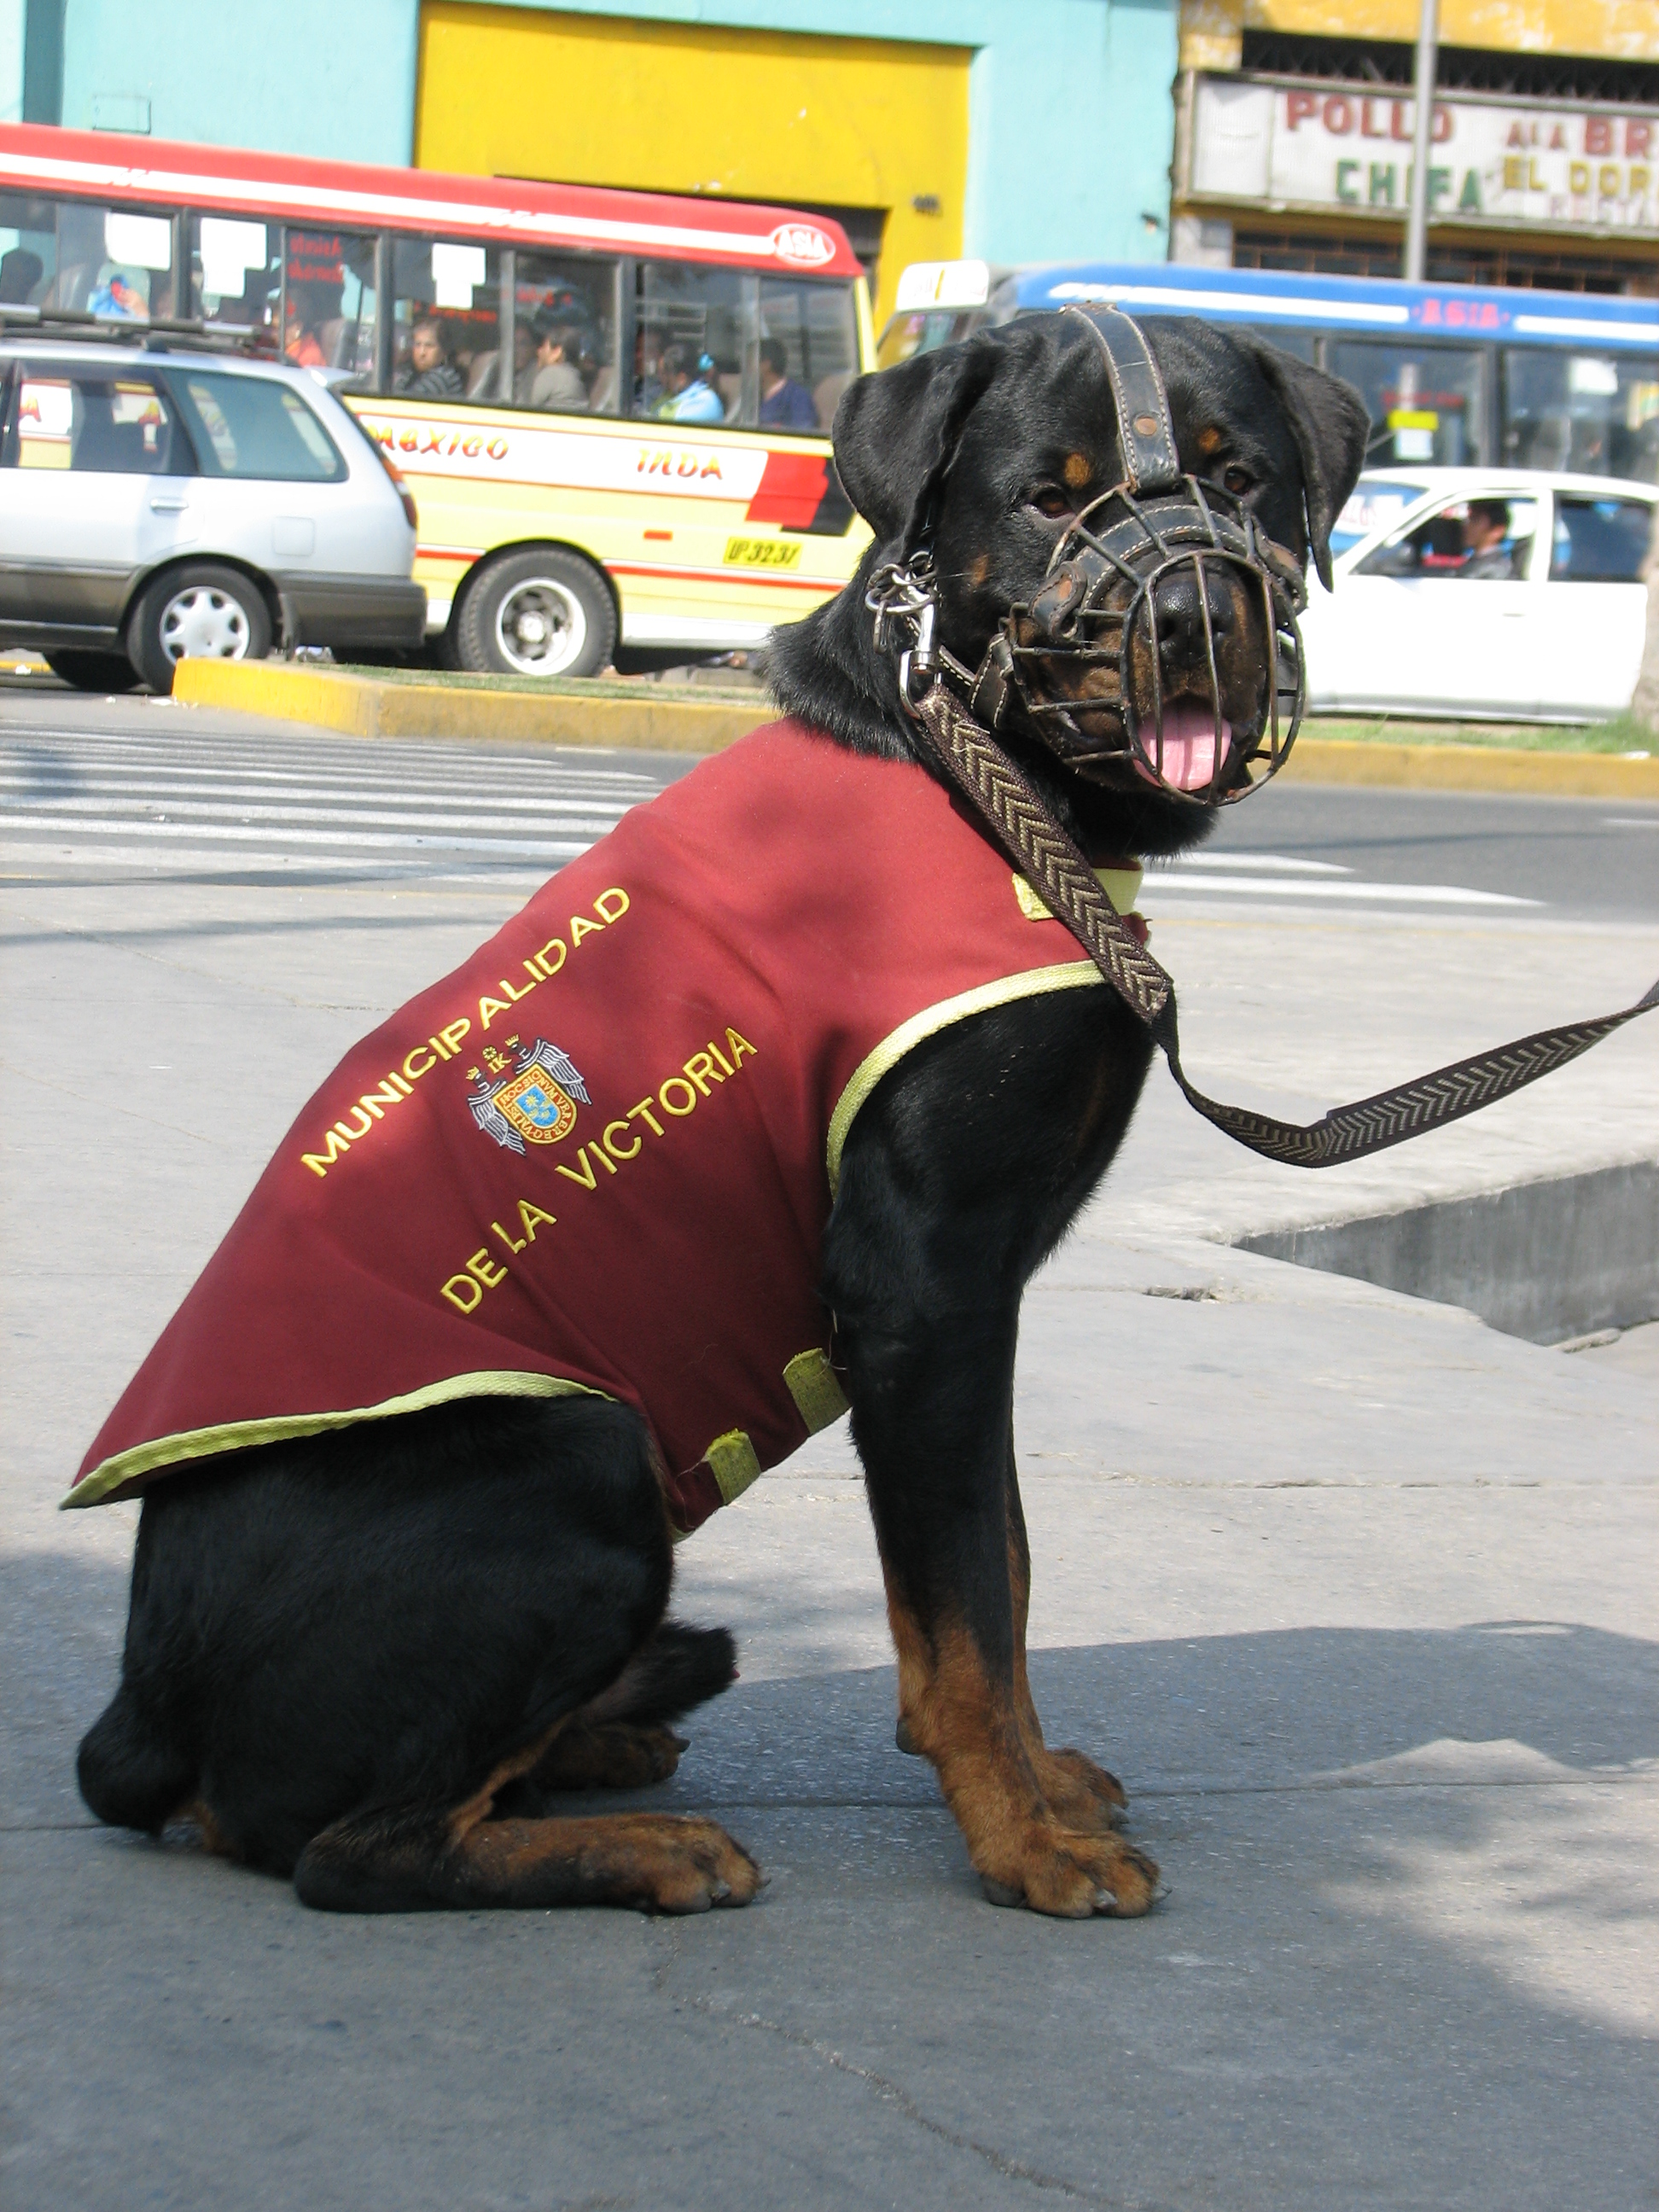 https://upload.wikimedia.org/wikipedia/commons/2/2a/Police_dog_Peru_Lima_La_Victoria_Plaza_Manco_C%C3%A1pac.jpg